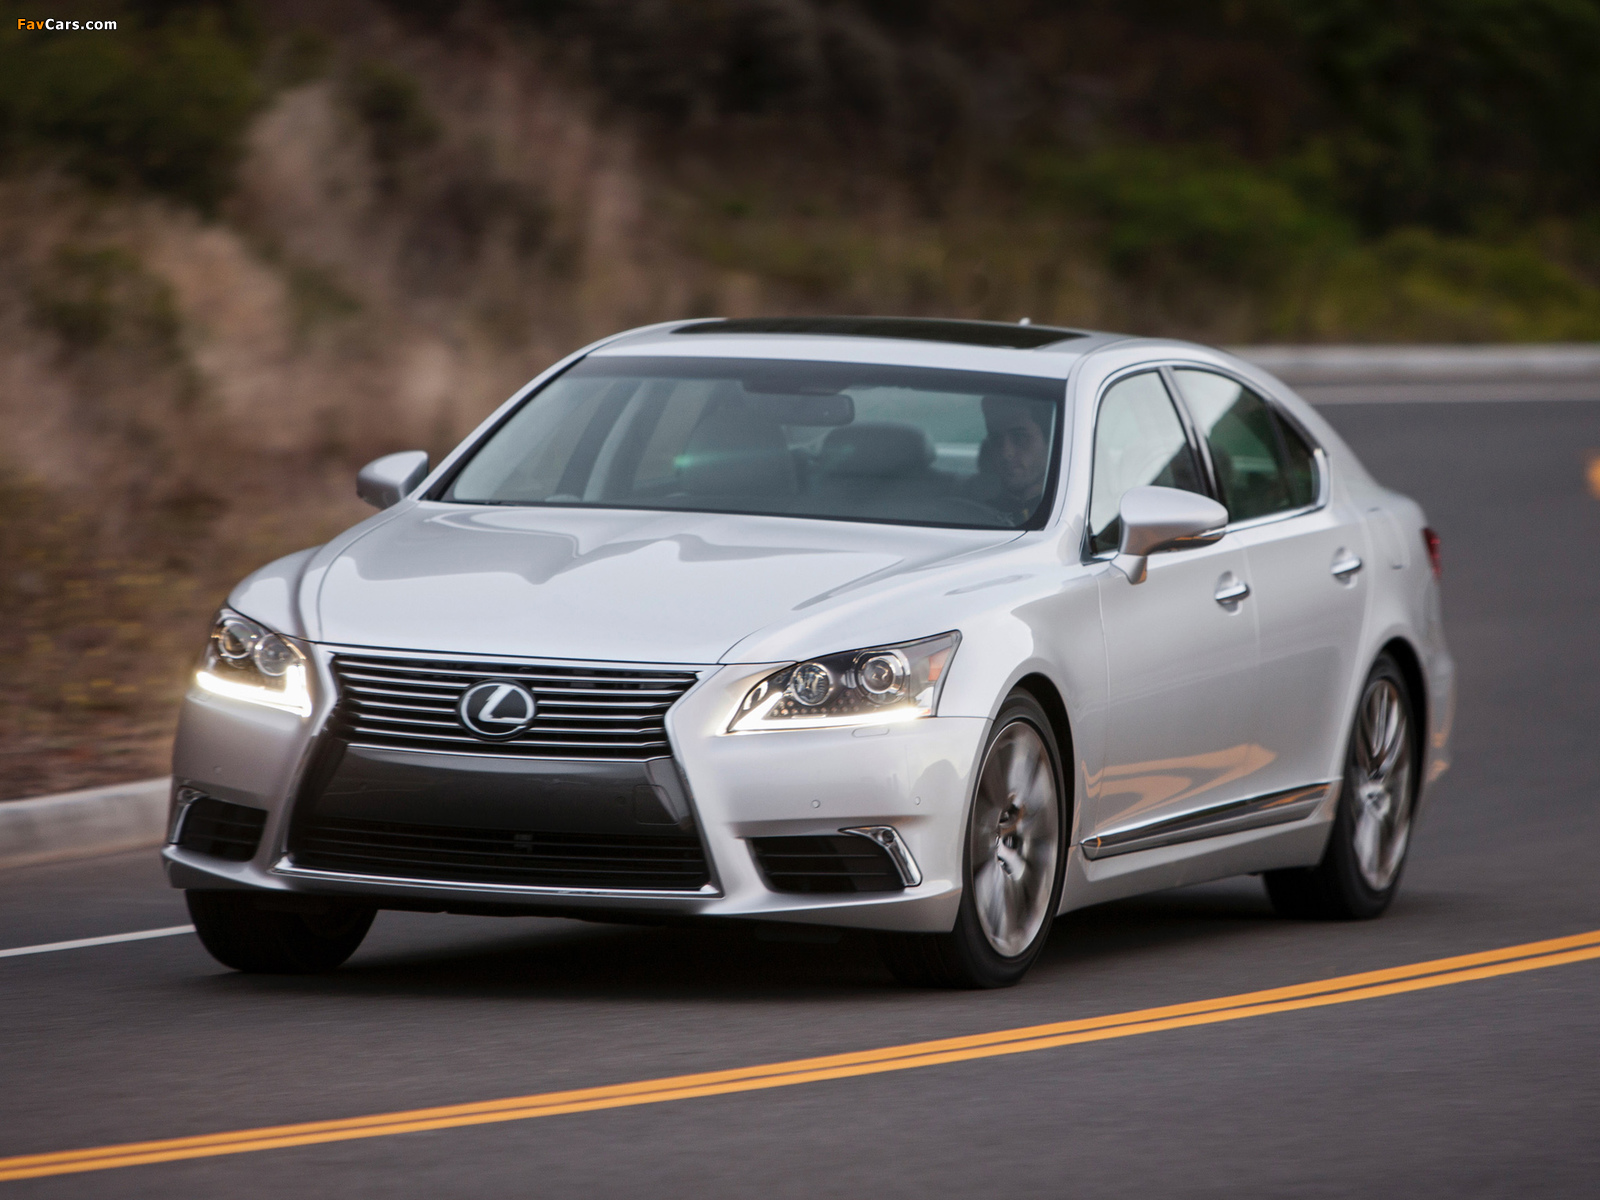 Lexus LS 460 2012 pictures (1600 x 1200)